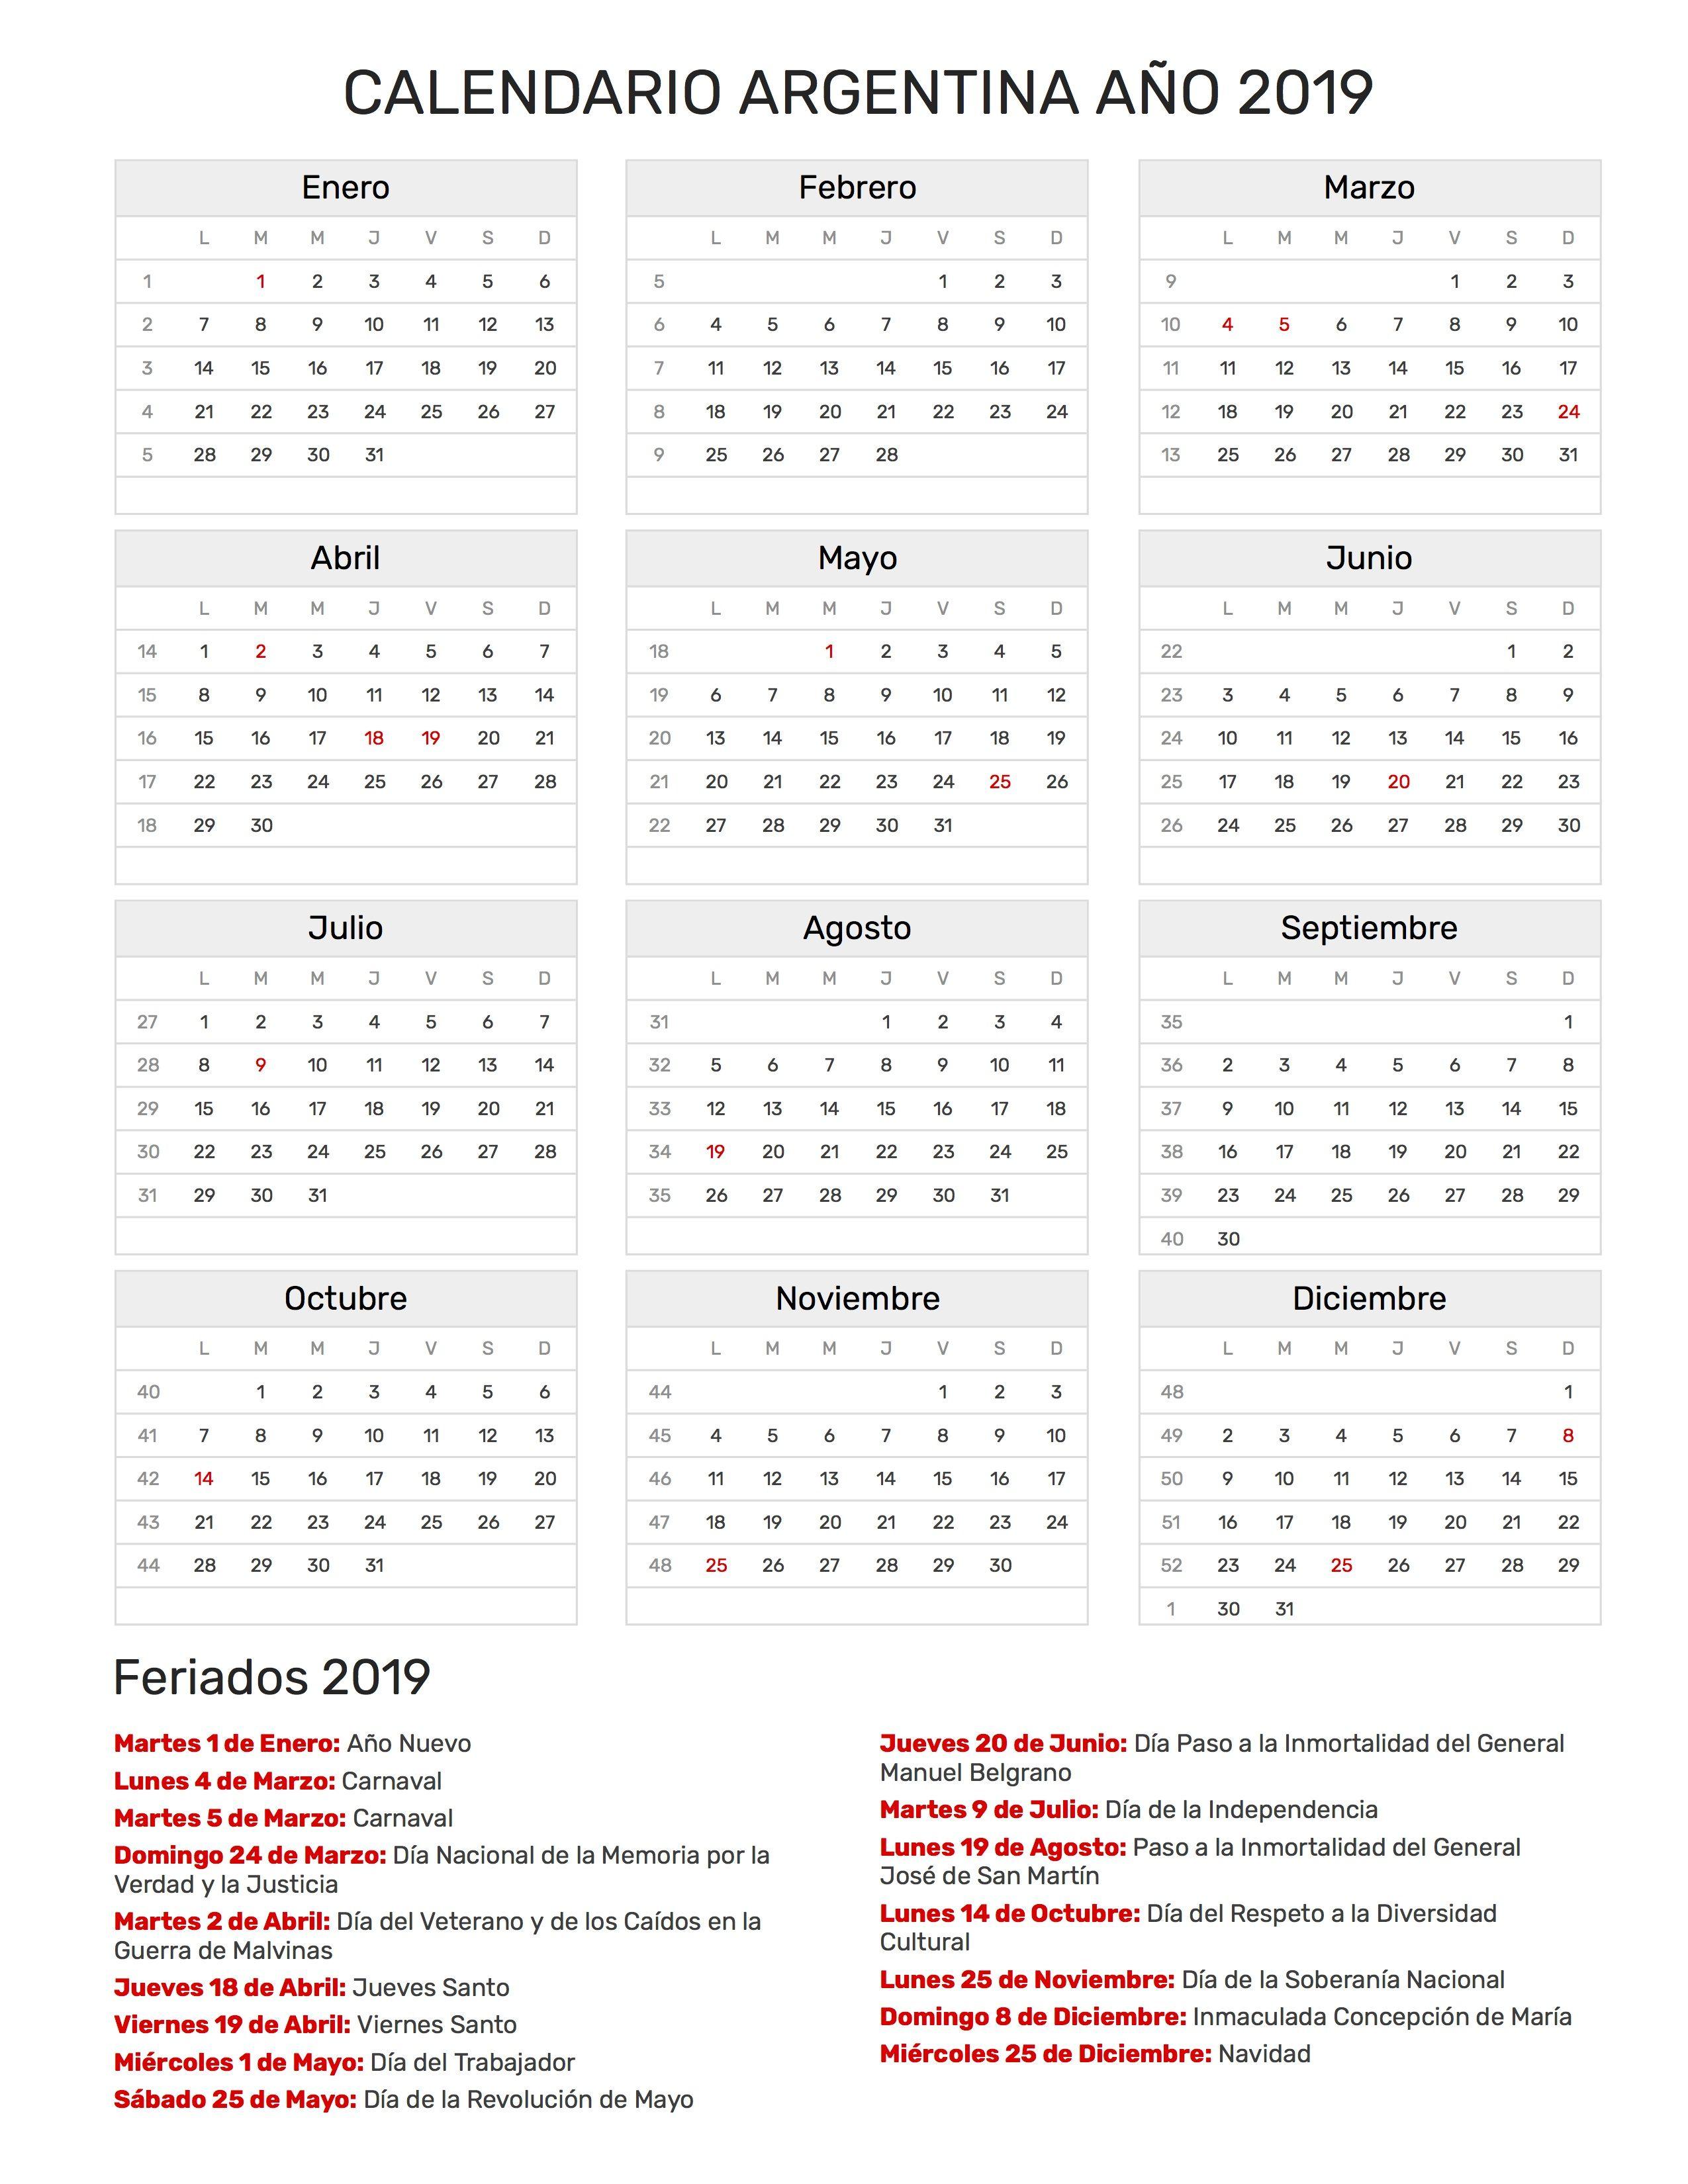 Calendario Word 2019.Calendario 2019 Calendario 2019 Chile